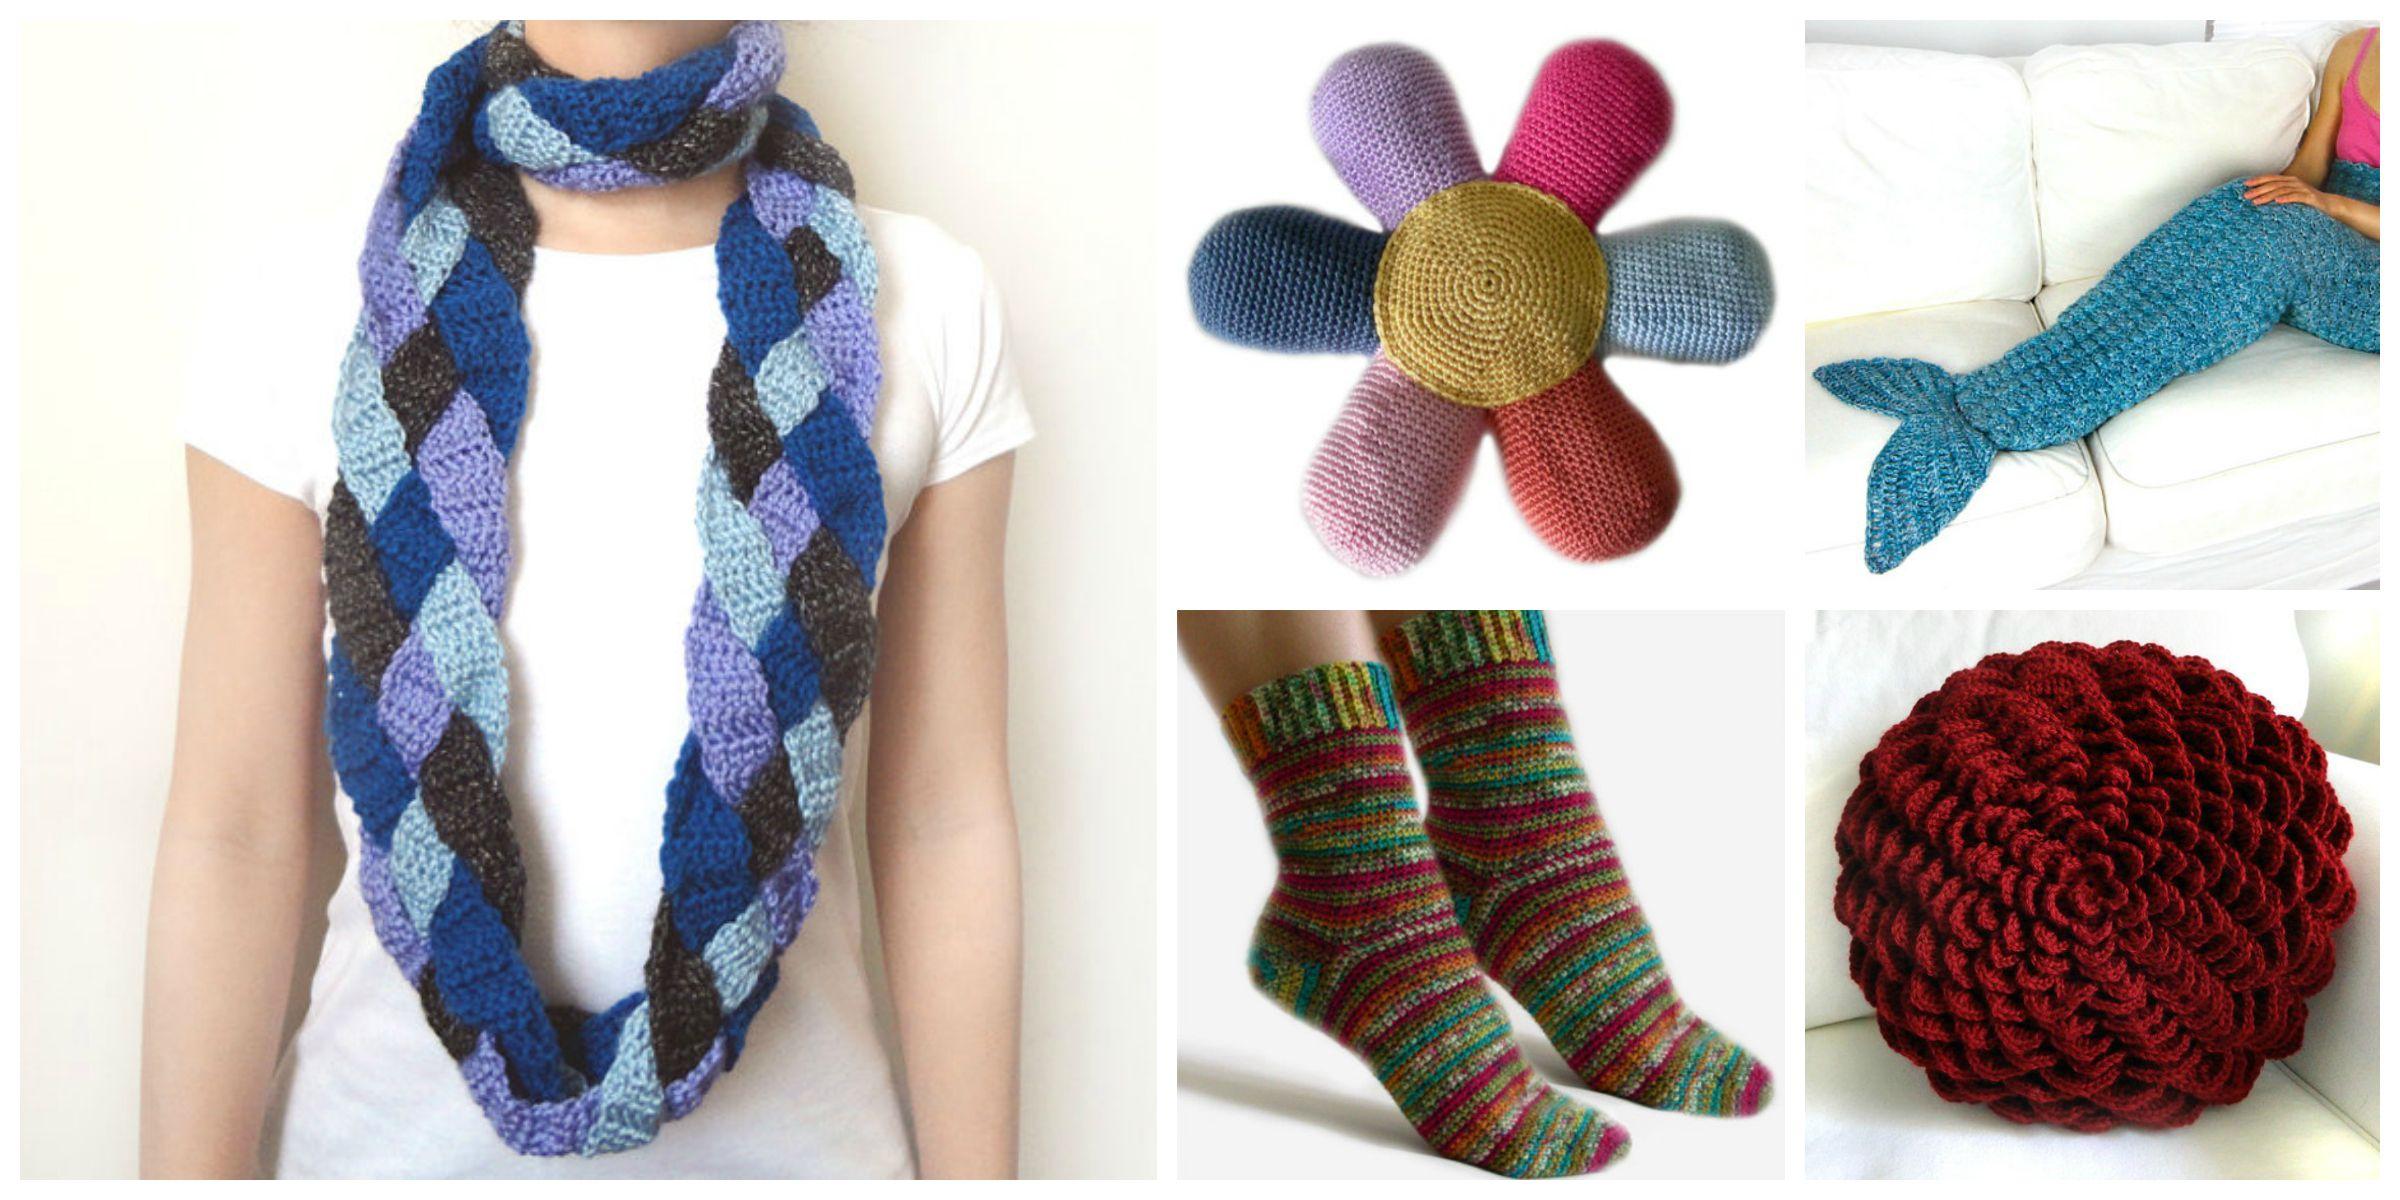 Designer Spotlight Fun Crochet Patterns Designed By Rachel Choi Of